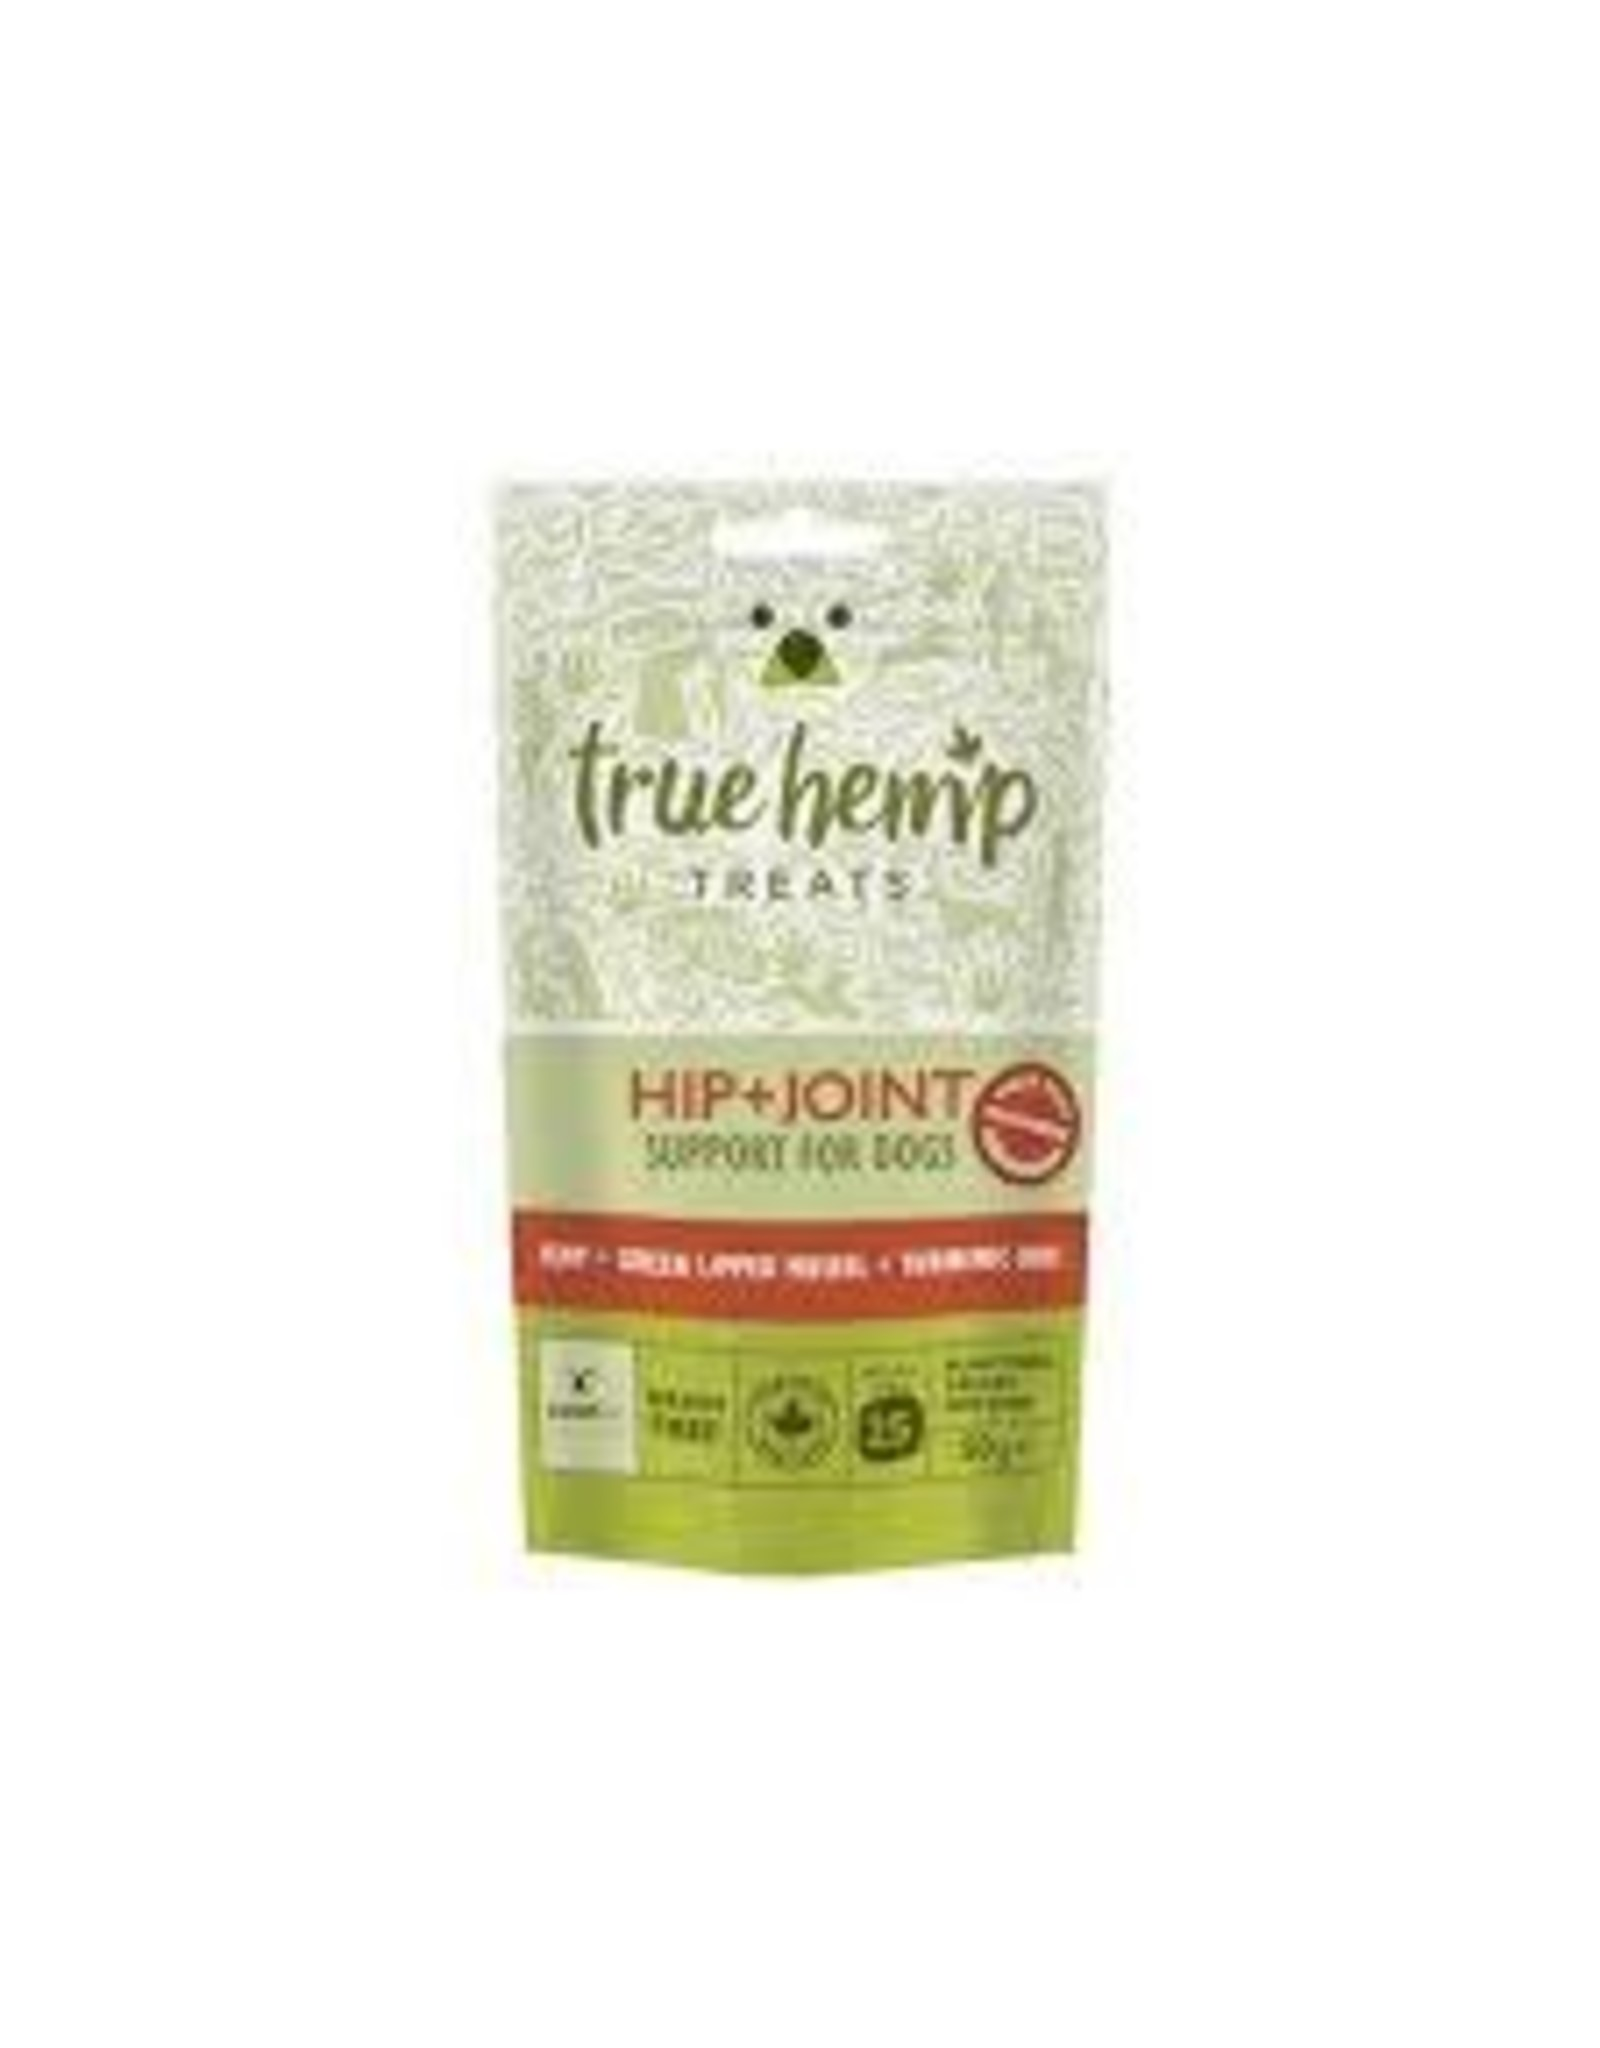 TRUE HEMP TRUE HEMP HIP AND JOINT